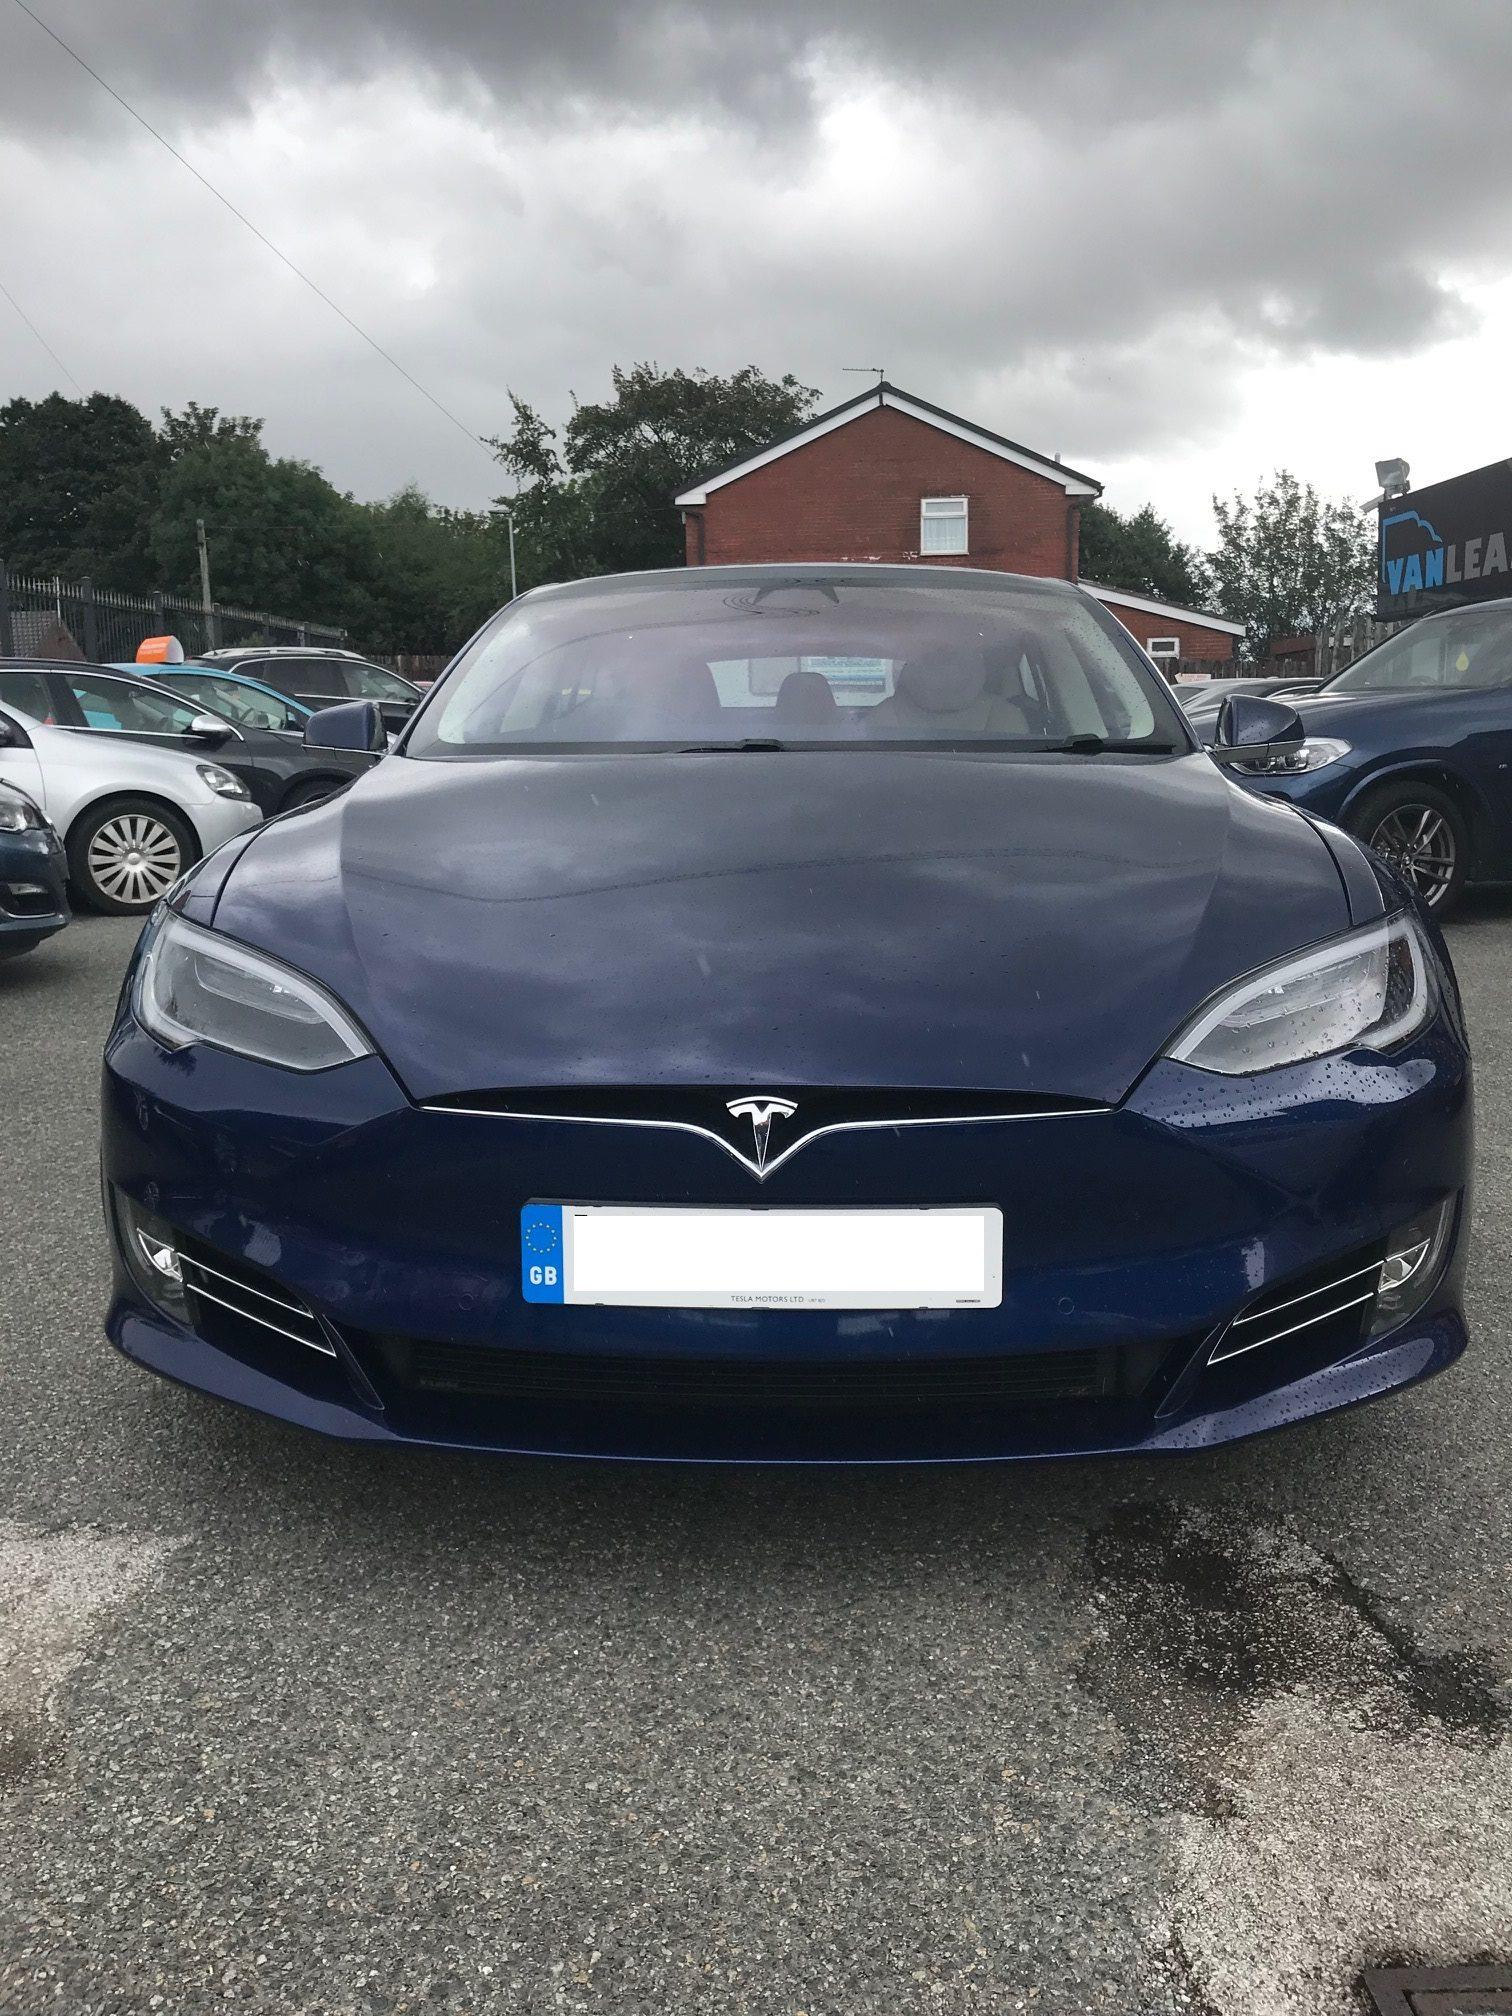 Tesla MODEL S HATCHBACK 90kWh Dual Motor 5dr Auto Car Leasing